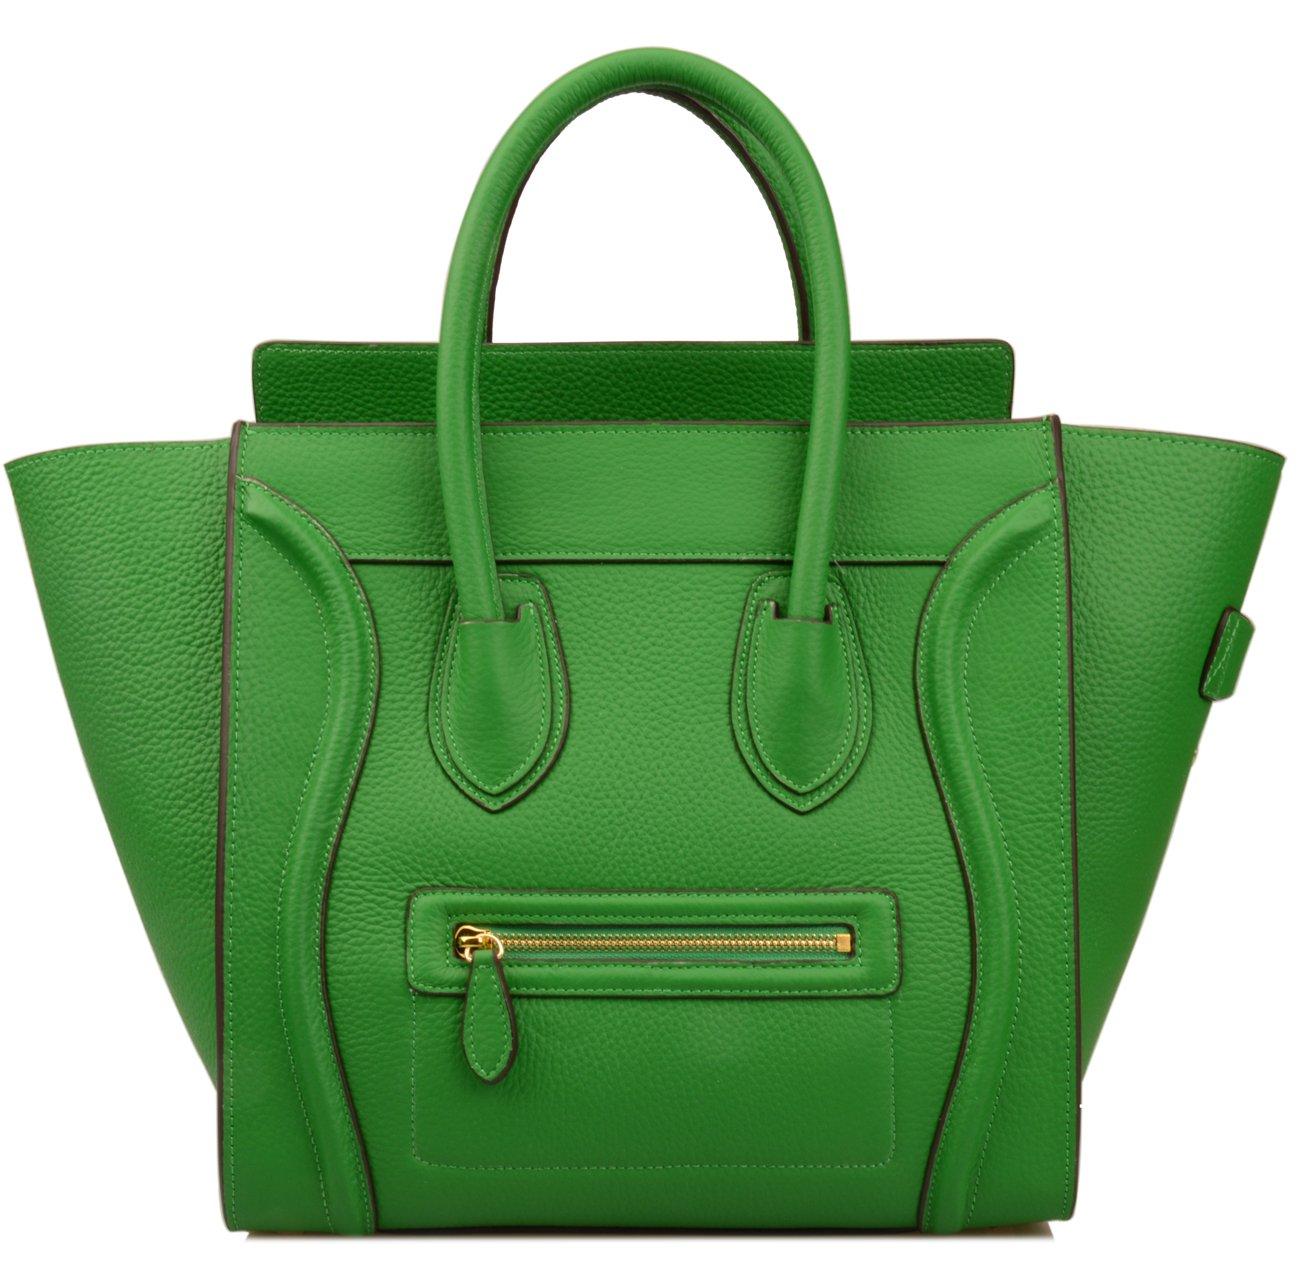 Ainifeel Women's Genuine Leather Smile Large Top Handle Handbag Purse (Large, Bamboo green)